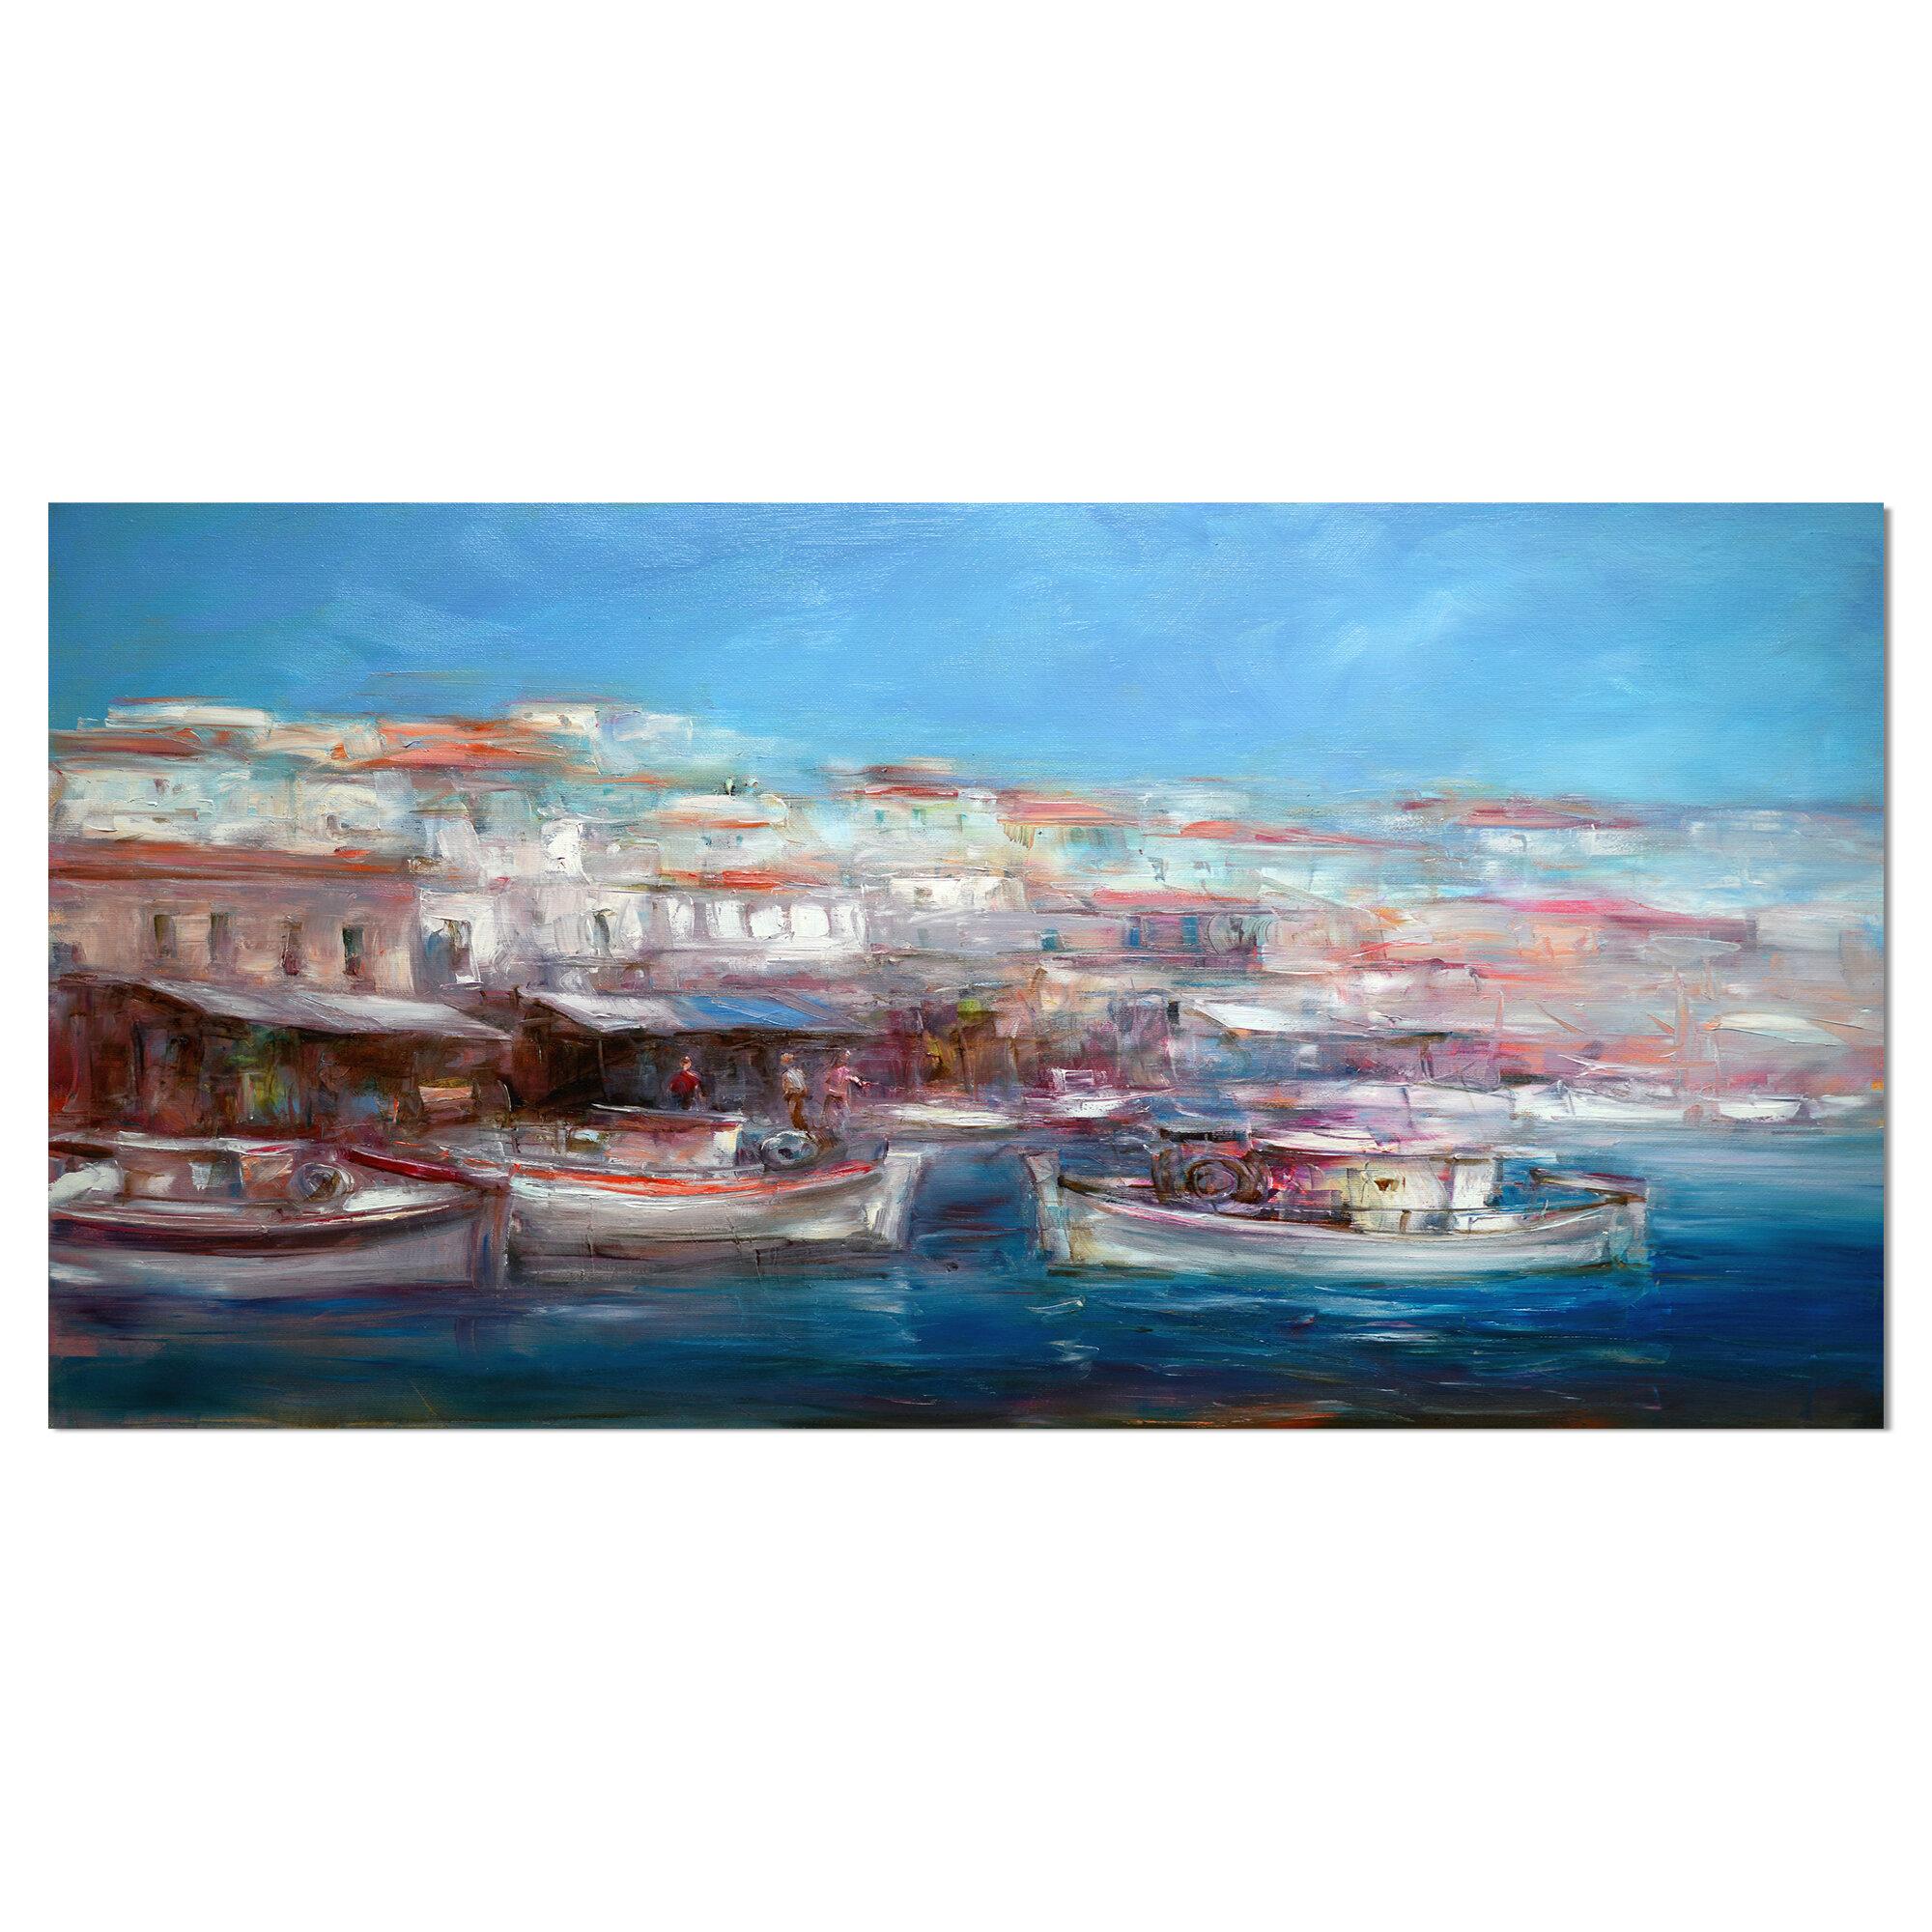 East Urban Home Venice Italy Boats On The Island Harbor Wrapped Canvas Print On Canvas Wayfair